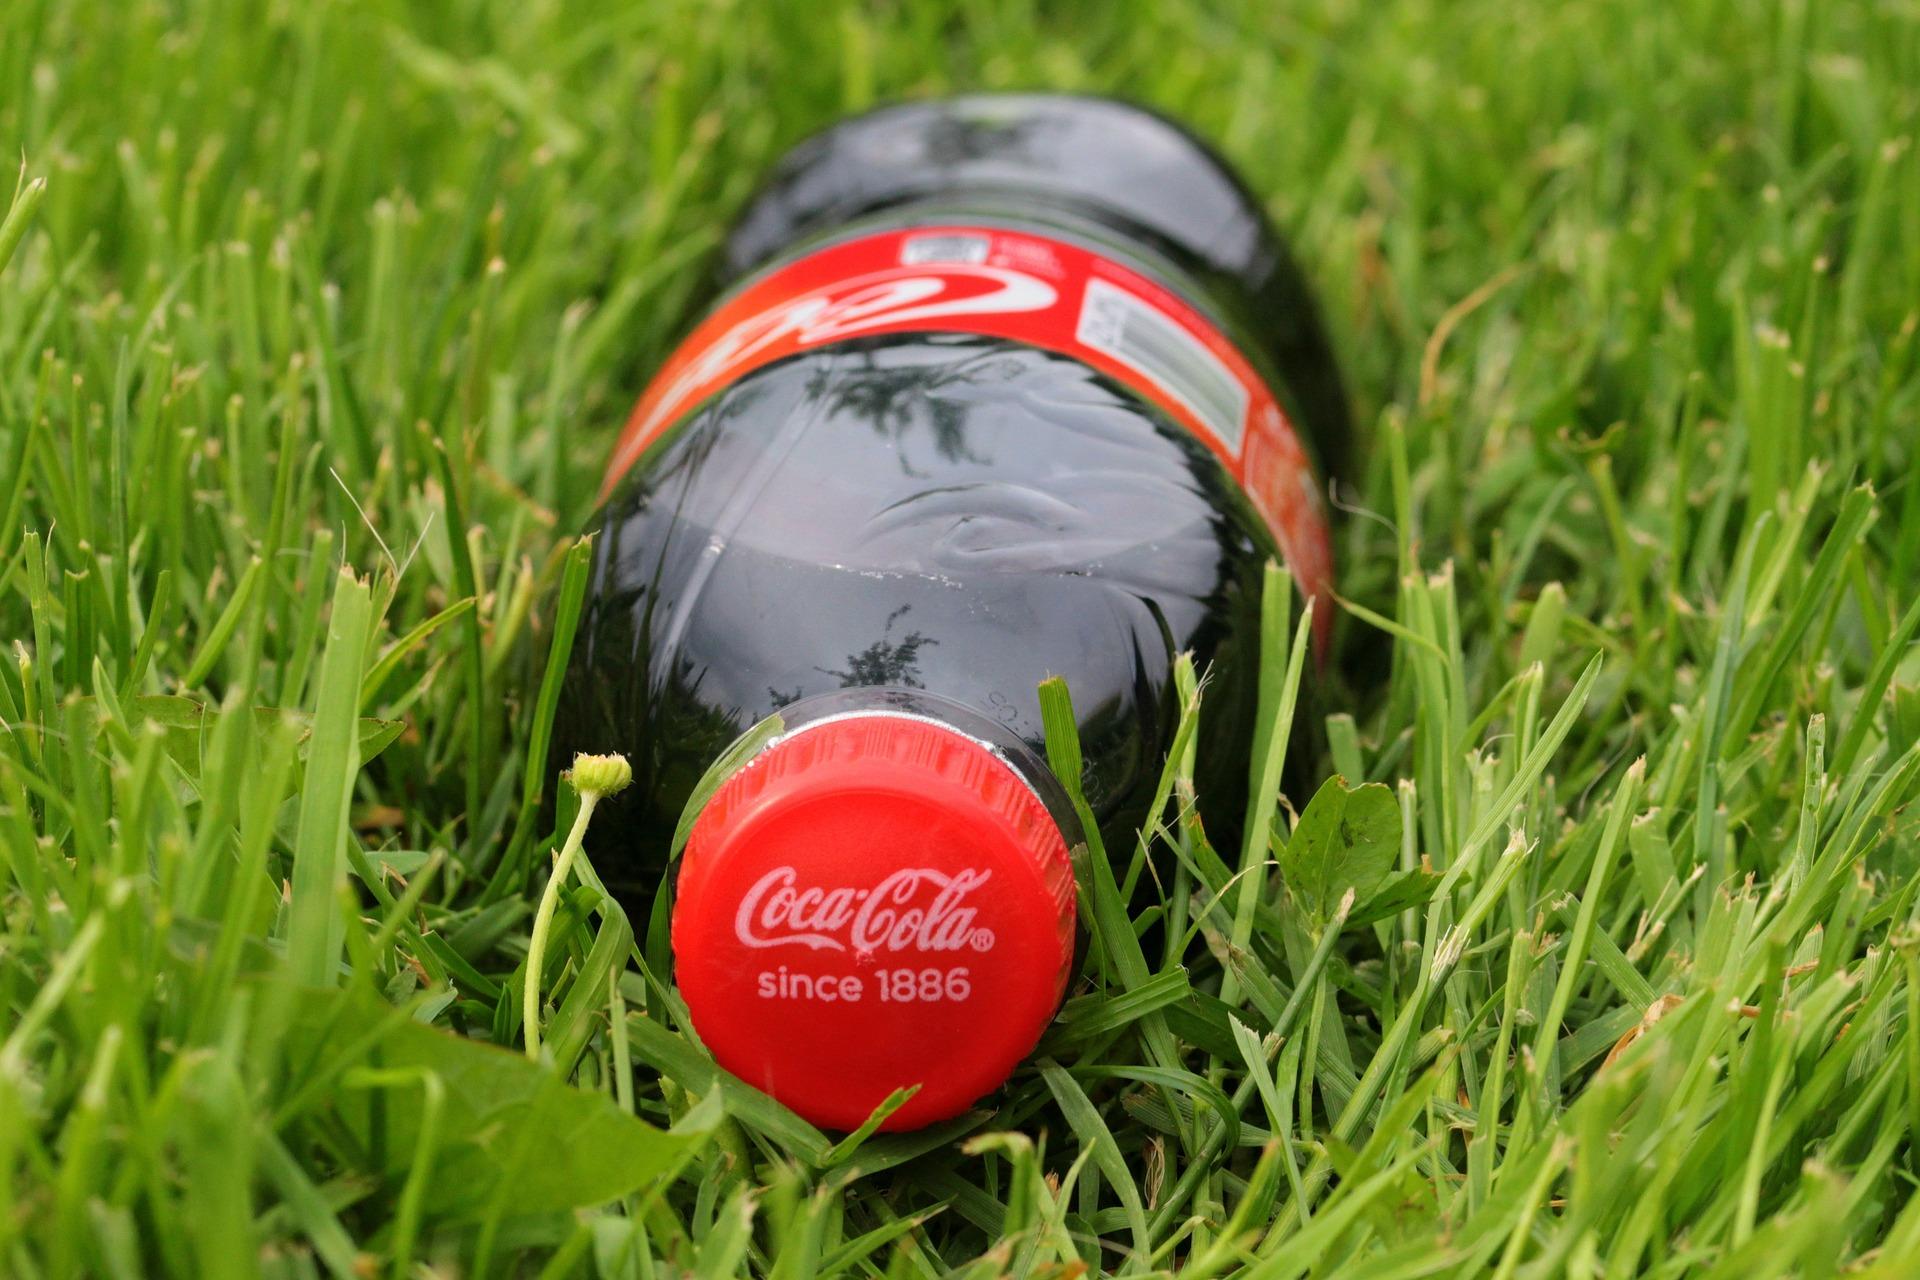 coca-cola sustainability